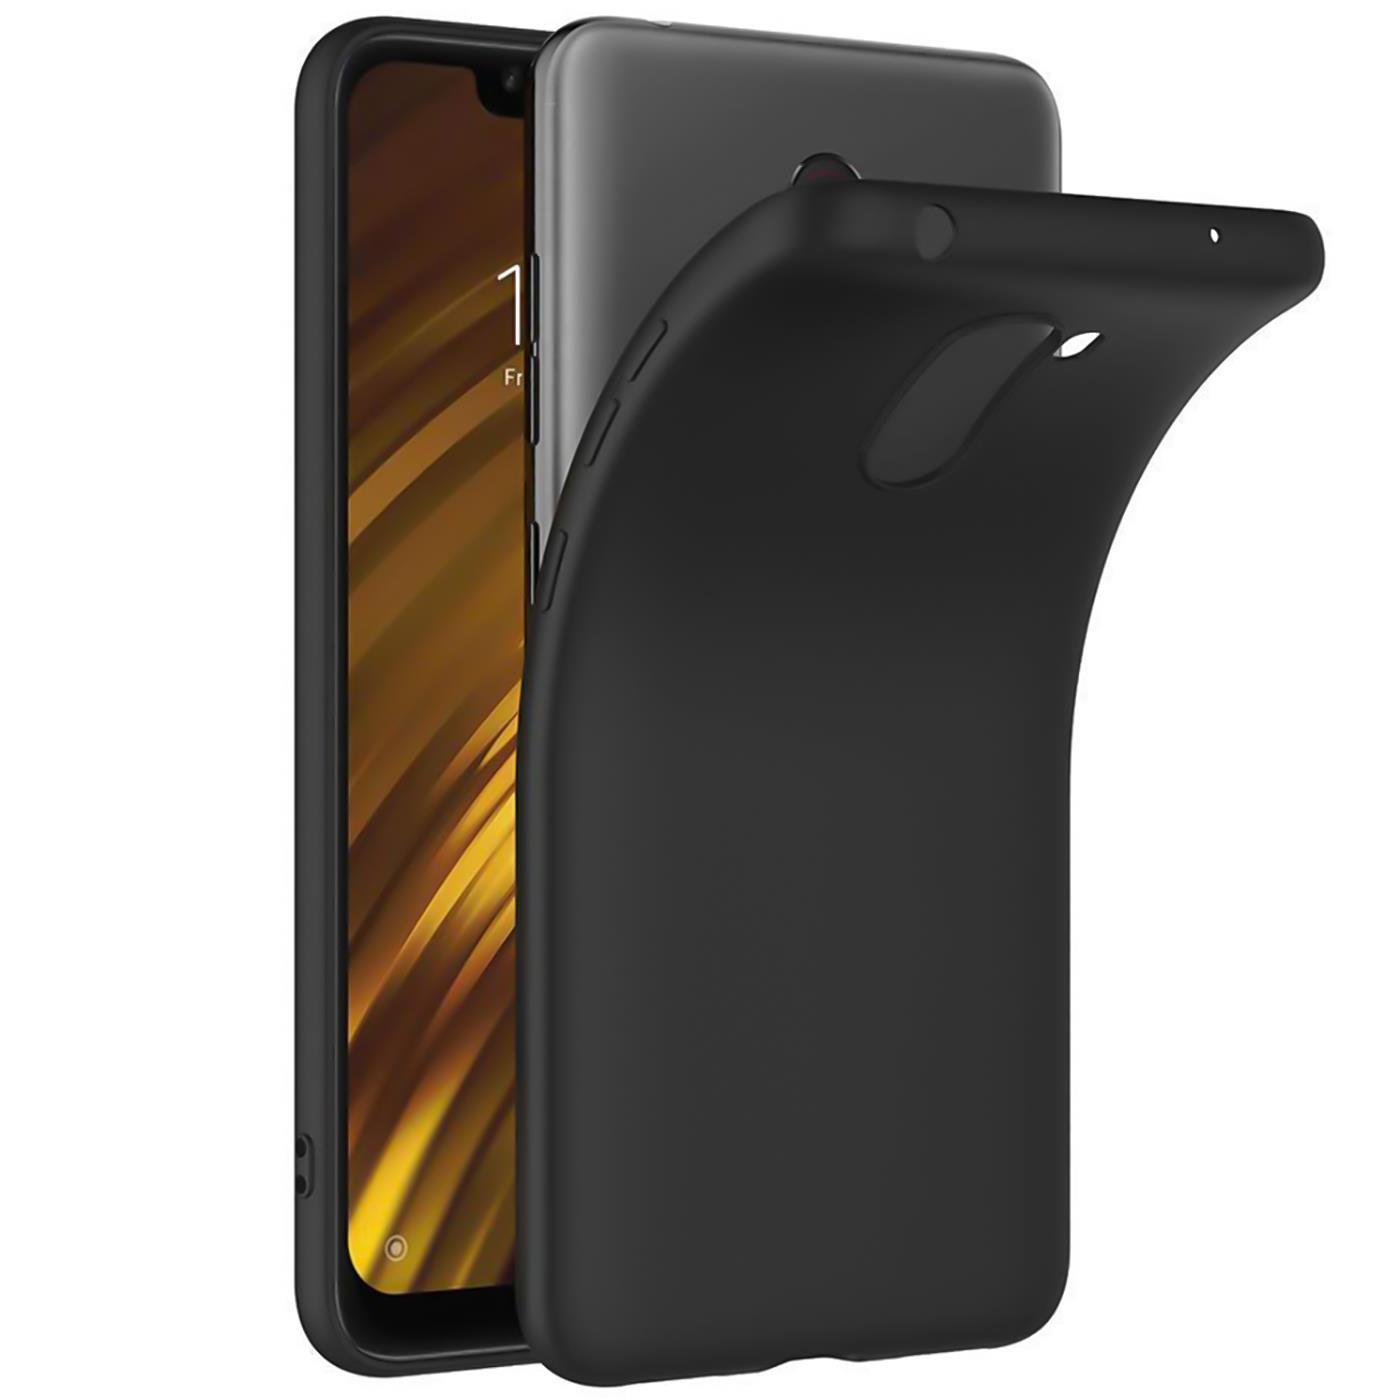 Klapph/ülle mit Kartenfach Brieftasche Lederh/ülle Stossfest Handyh/ülle Klappbar Case f/ür Xiaomi Pocophone F1 Tosim Xiaomi Pocophone F1 H/ülle Leder TOBFE150623 Blau